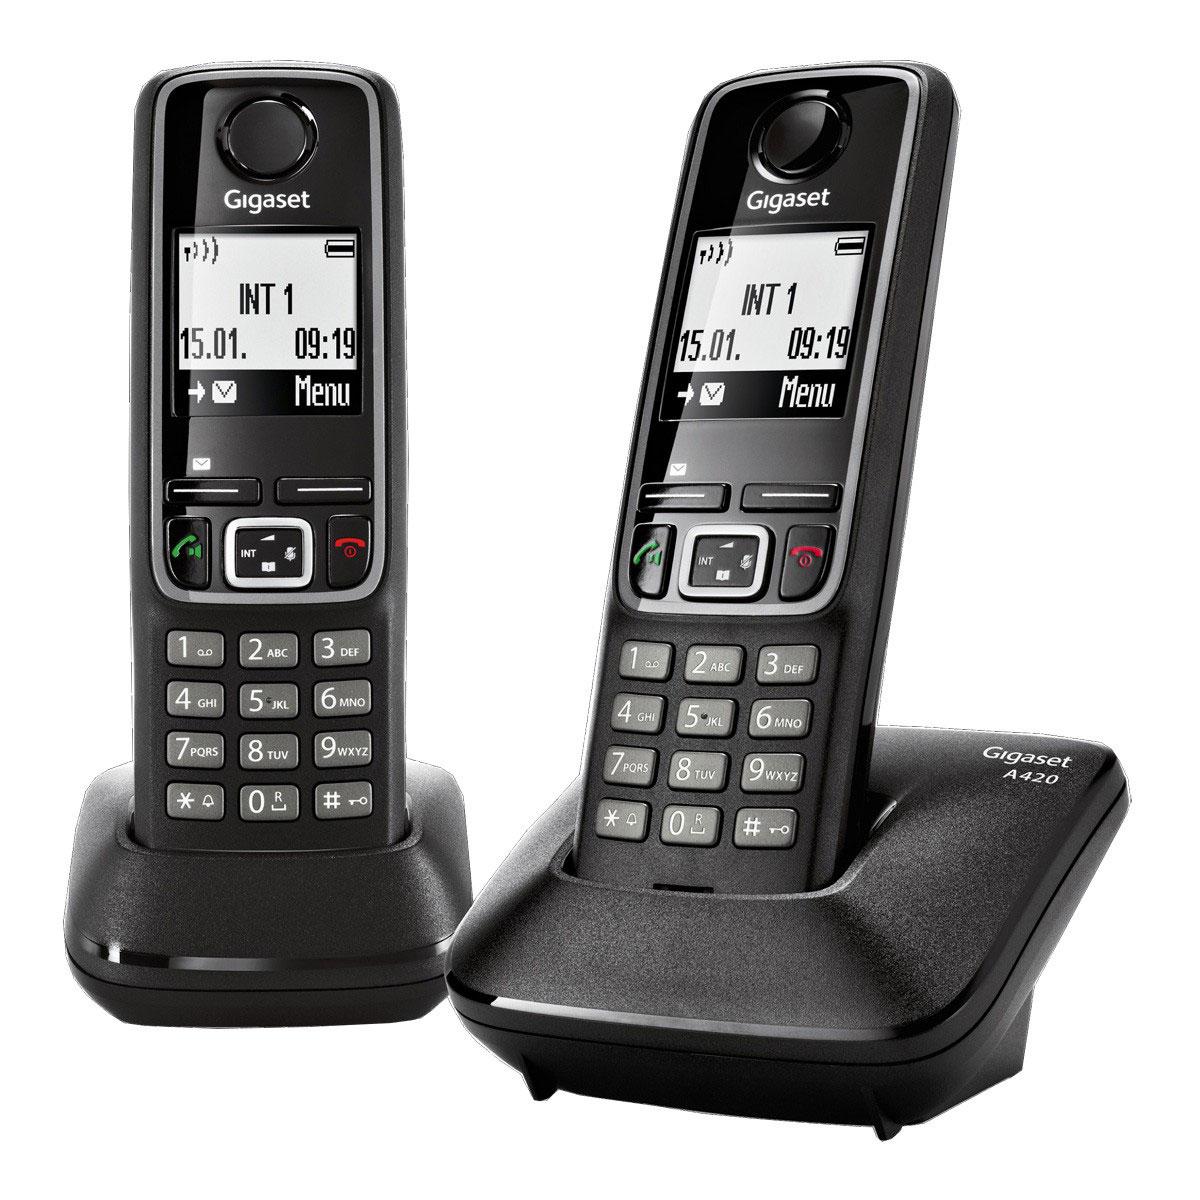 gigaset a420 duo noir t l phone sans fil gigaset sur ldlc. Black Bedroom Furniture Sets. Home Design Ideas